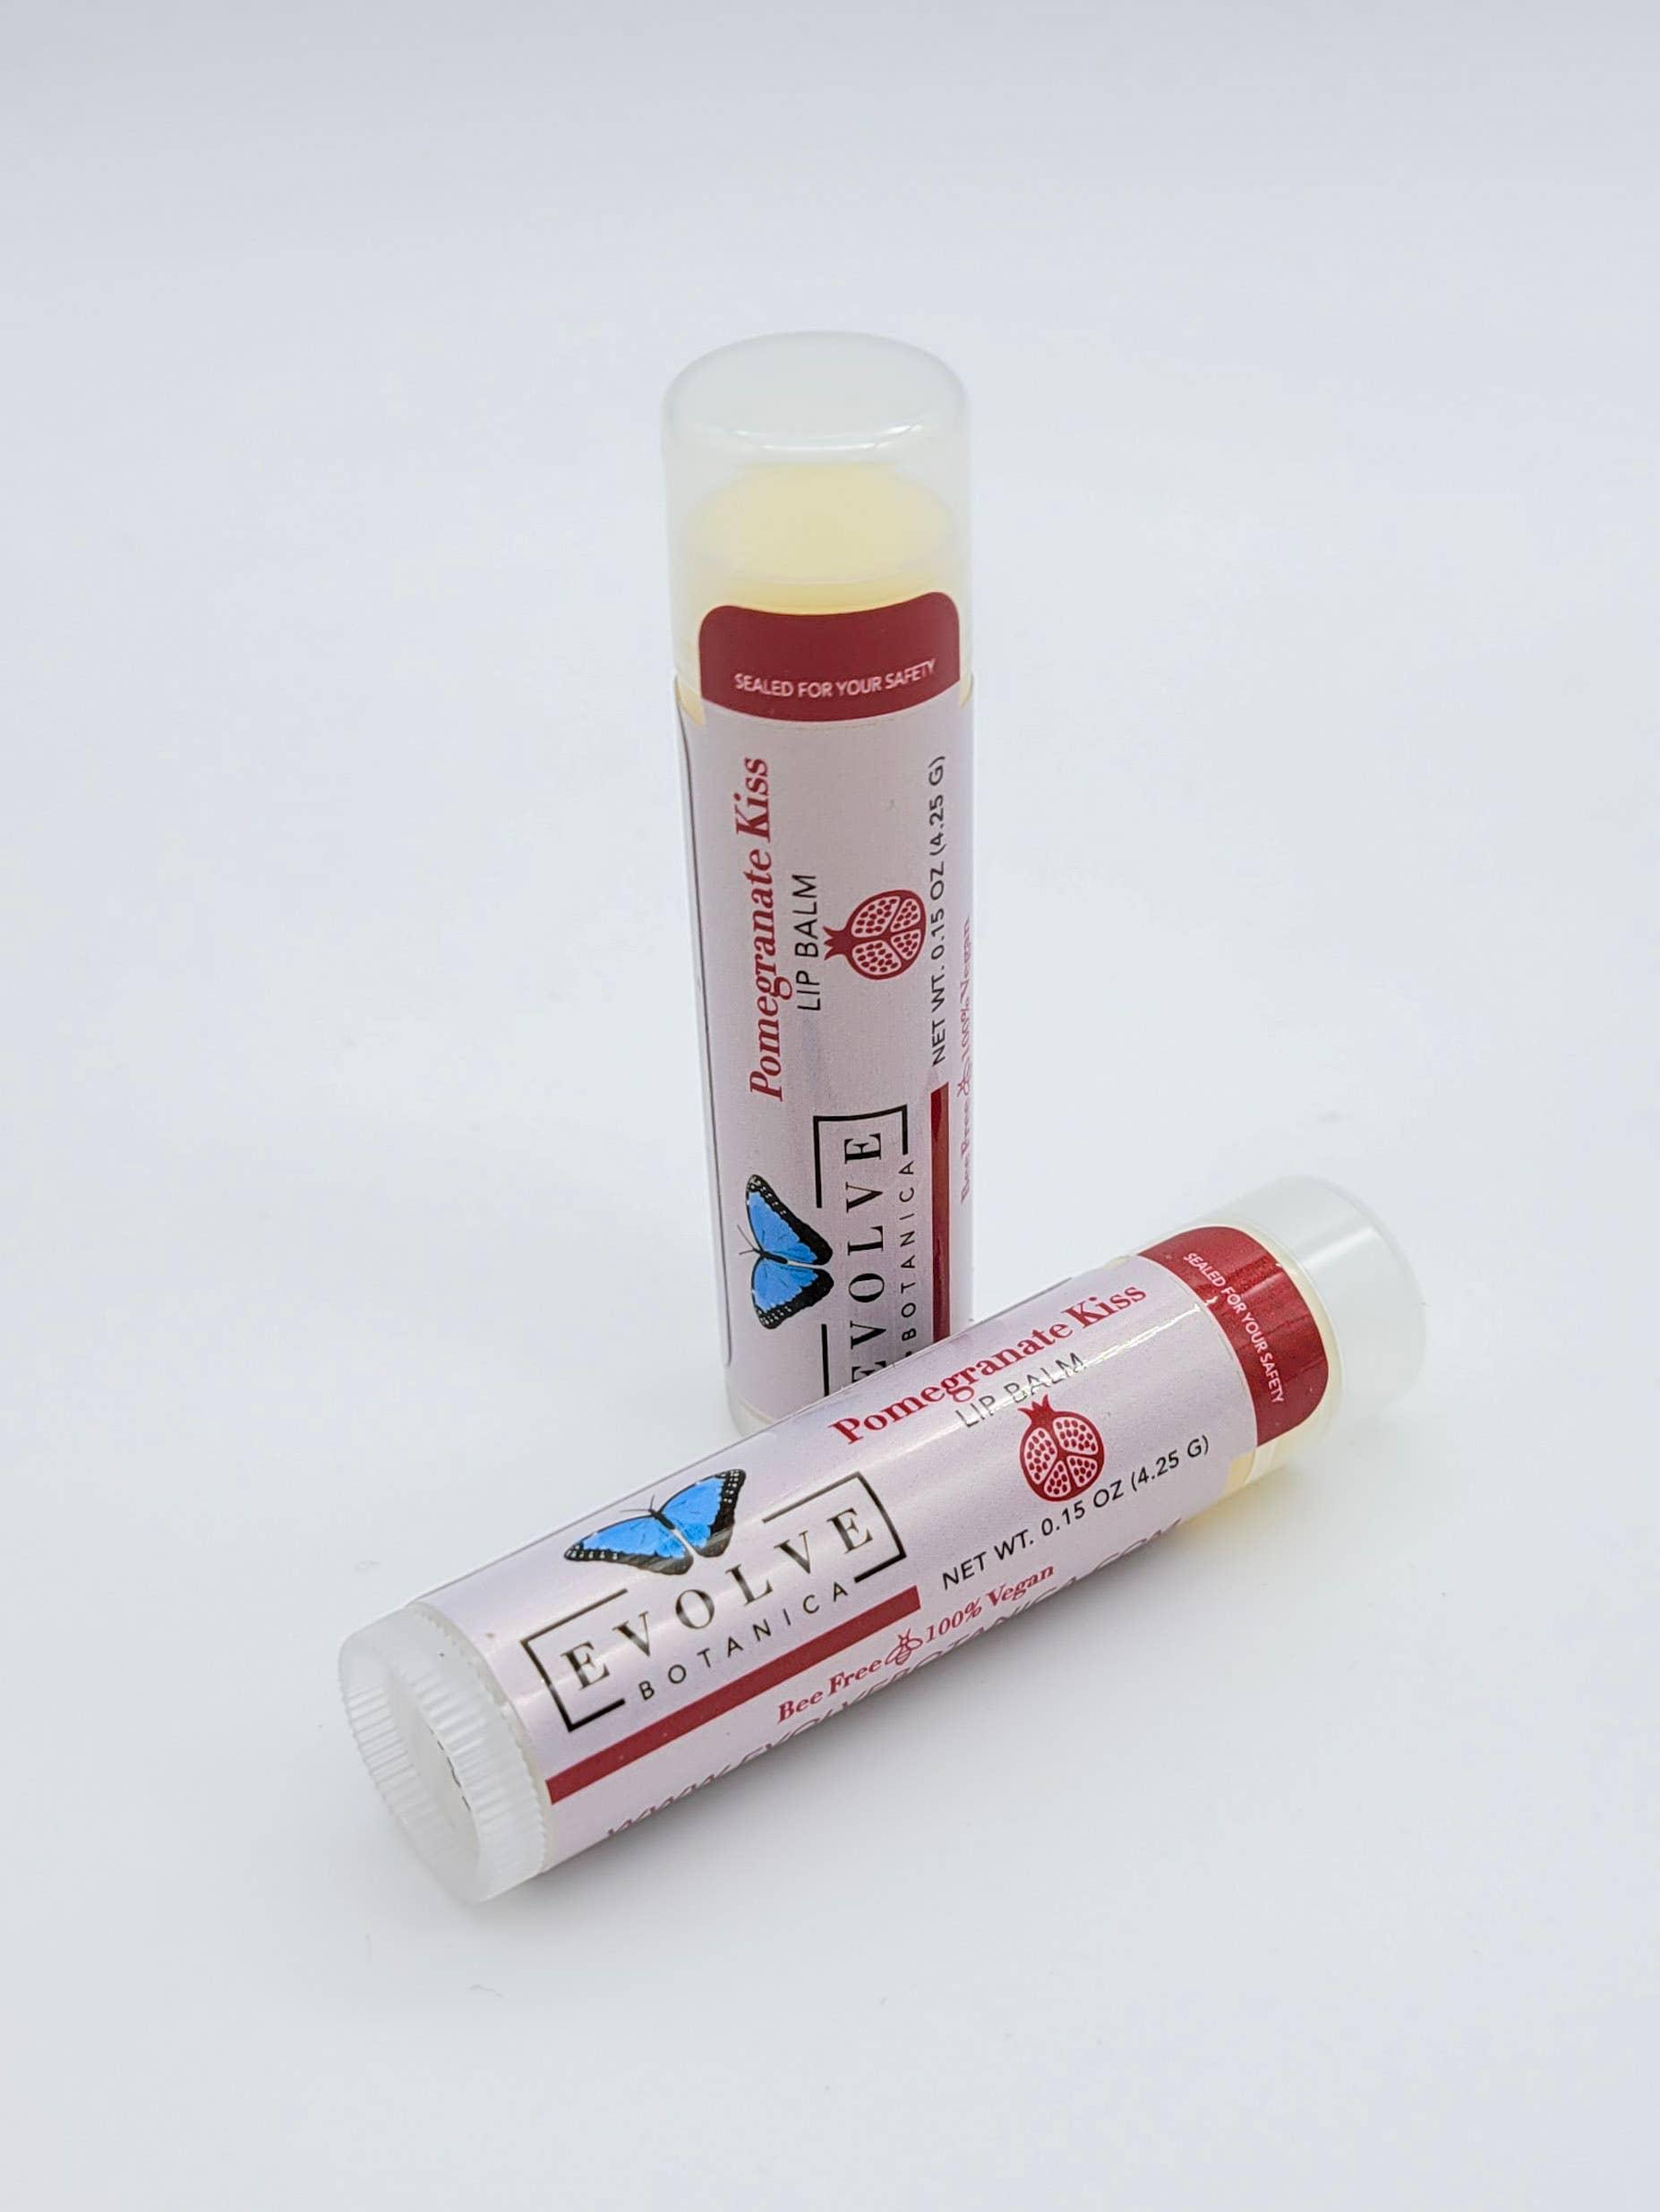 Evolve - Lip Balm - Pomegranate (Vegan) | Trada Marketplace